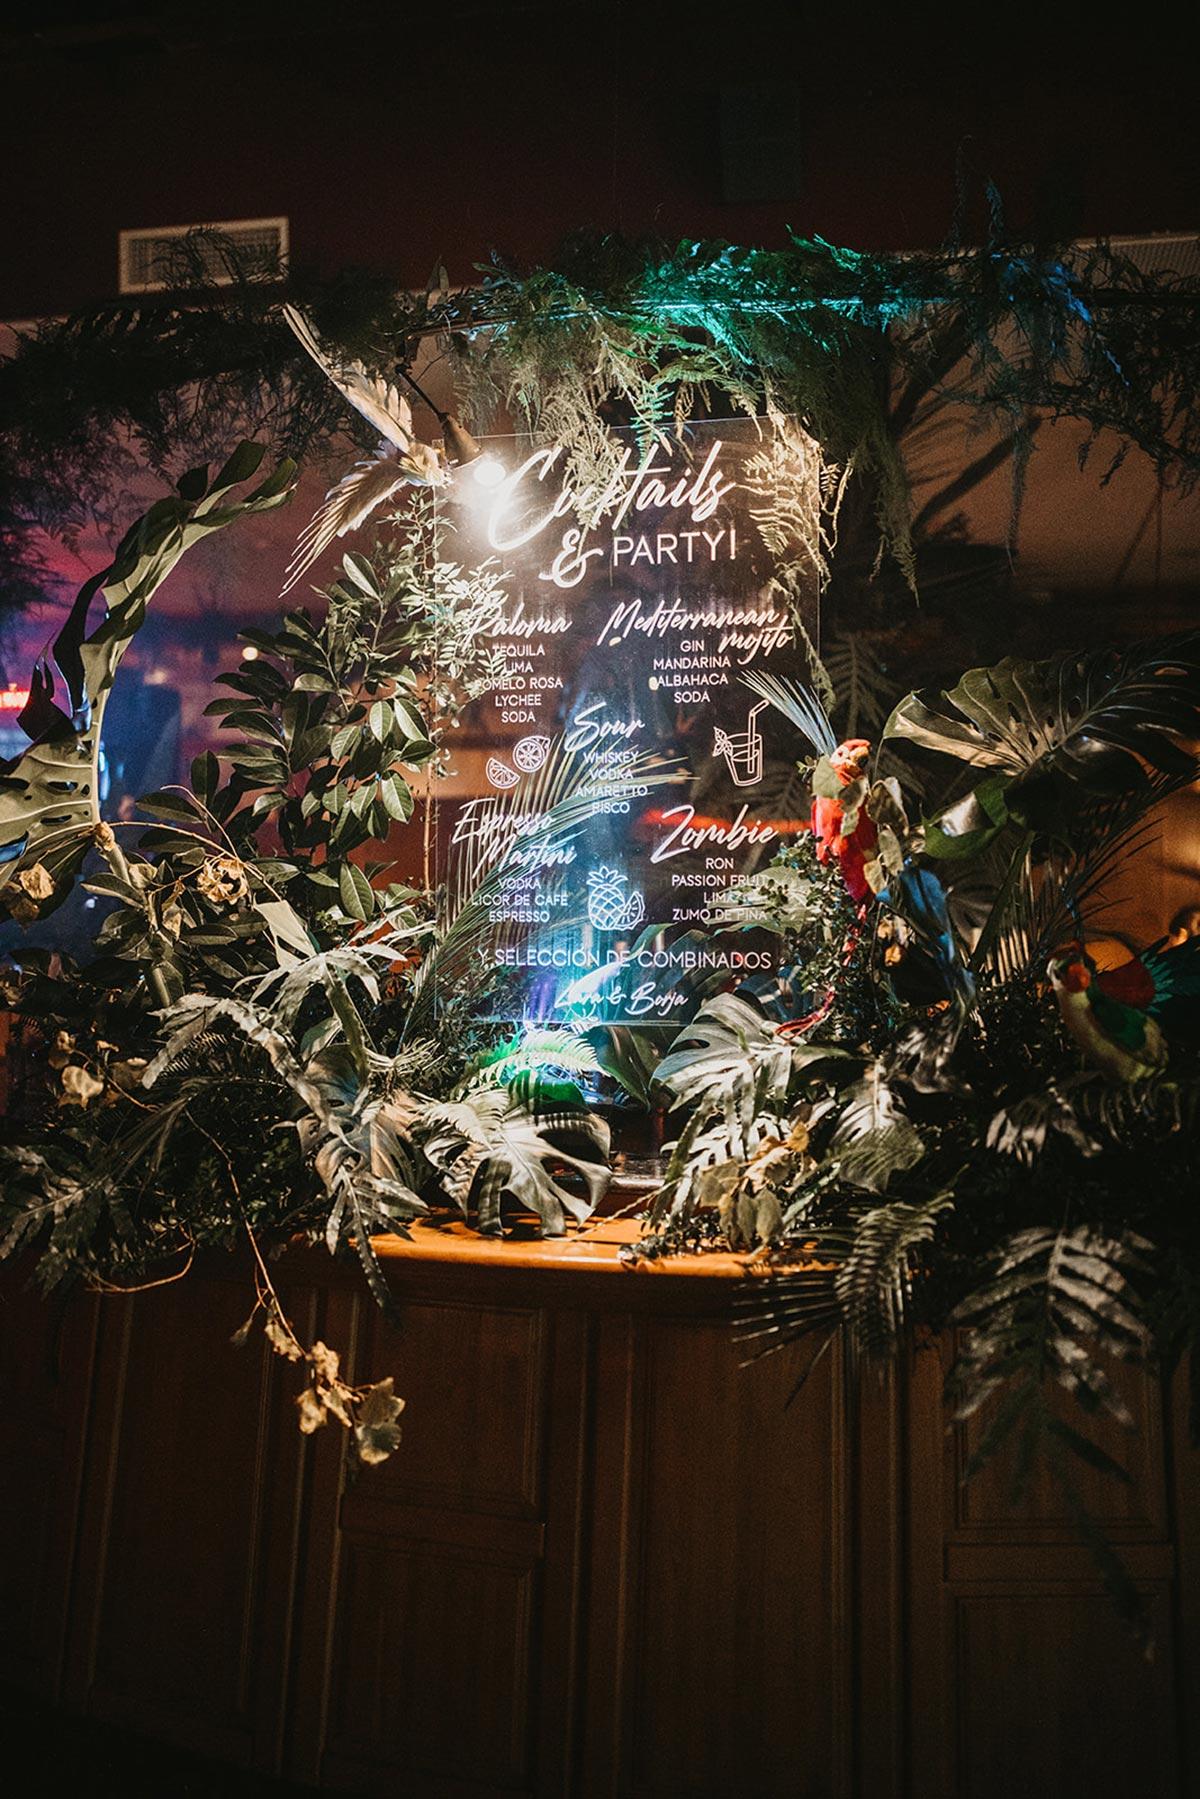 Fiesta tropical boda panel cristal cocktails & party caligrafia